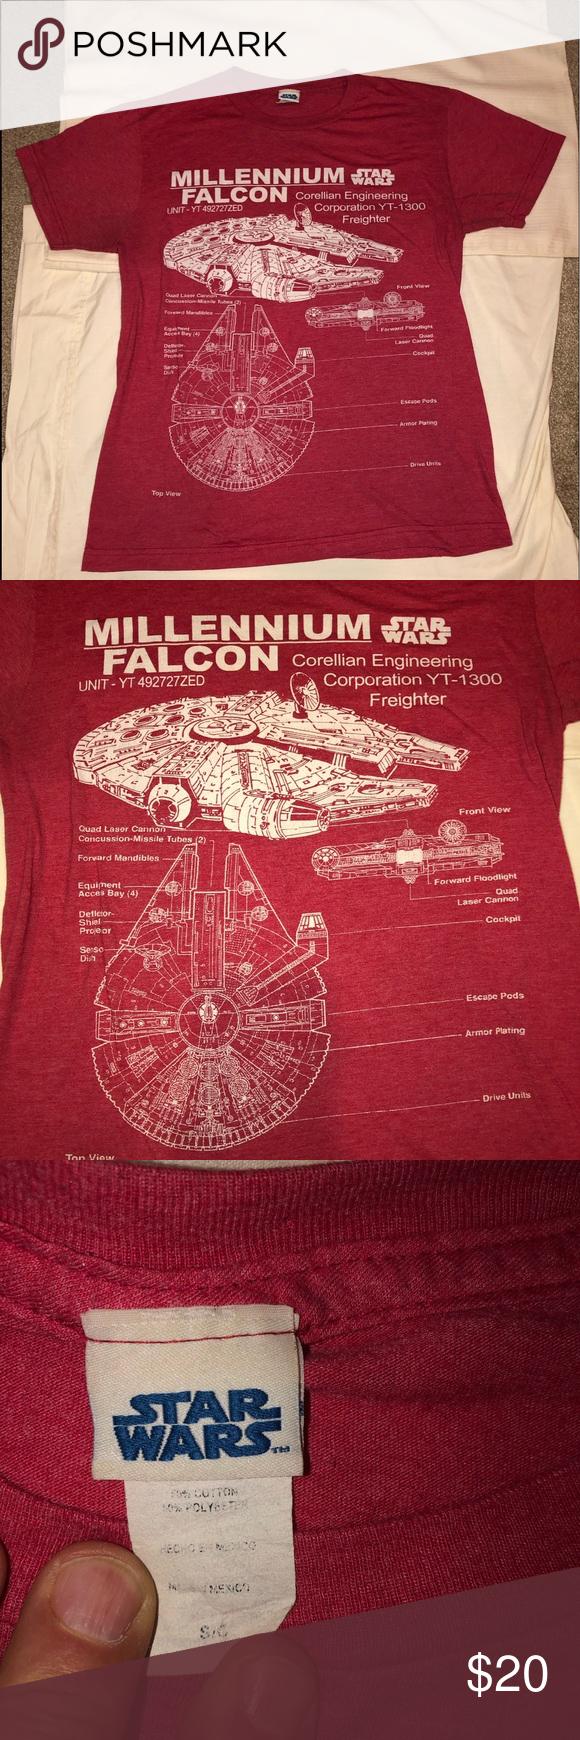 Vintage White Tag Star Wars Millennium Falcon T Vintage White Tag Star Wars Millennium Falcon T Shirt Thi Vintage Star Wars White Vintage Star Wars Shirts [ 1740 x 580 Pixel ]